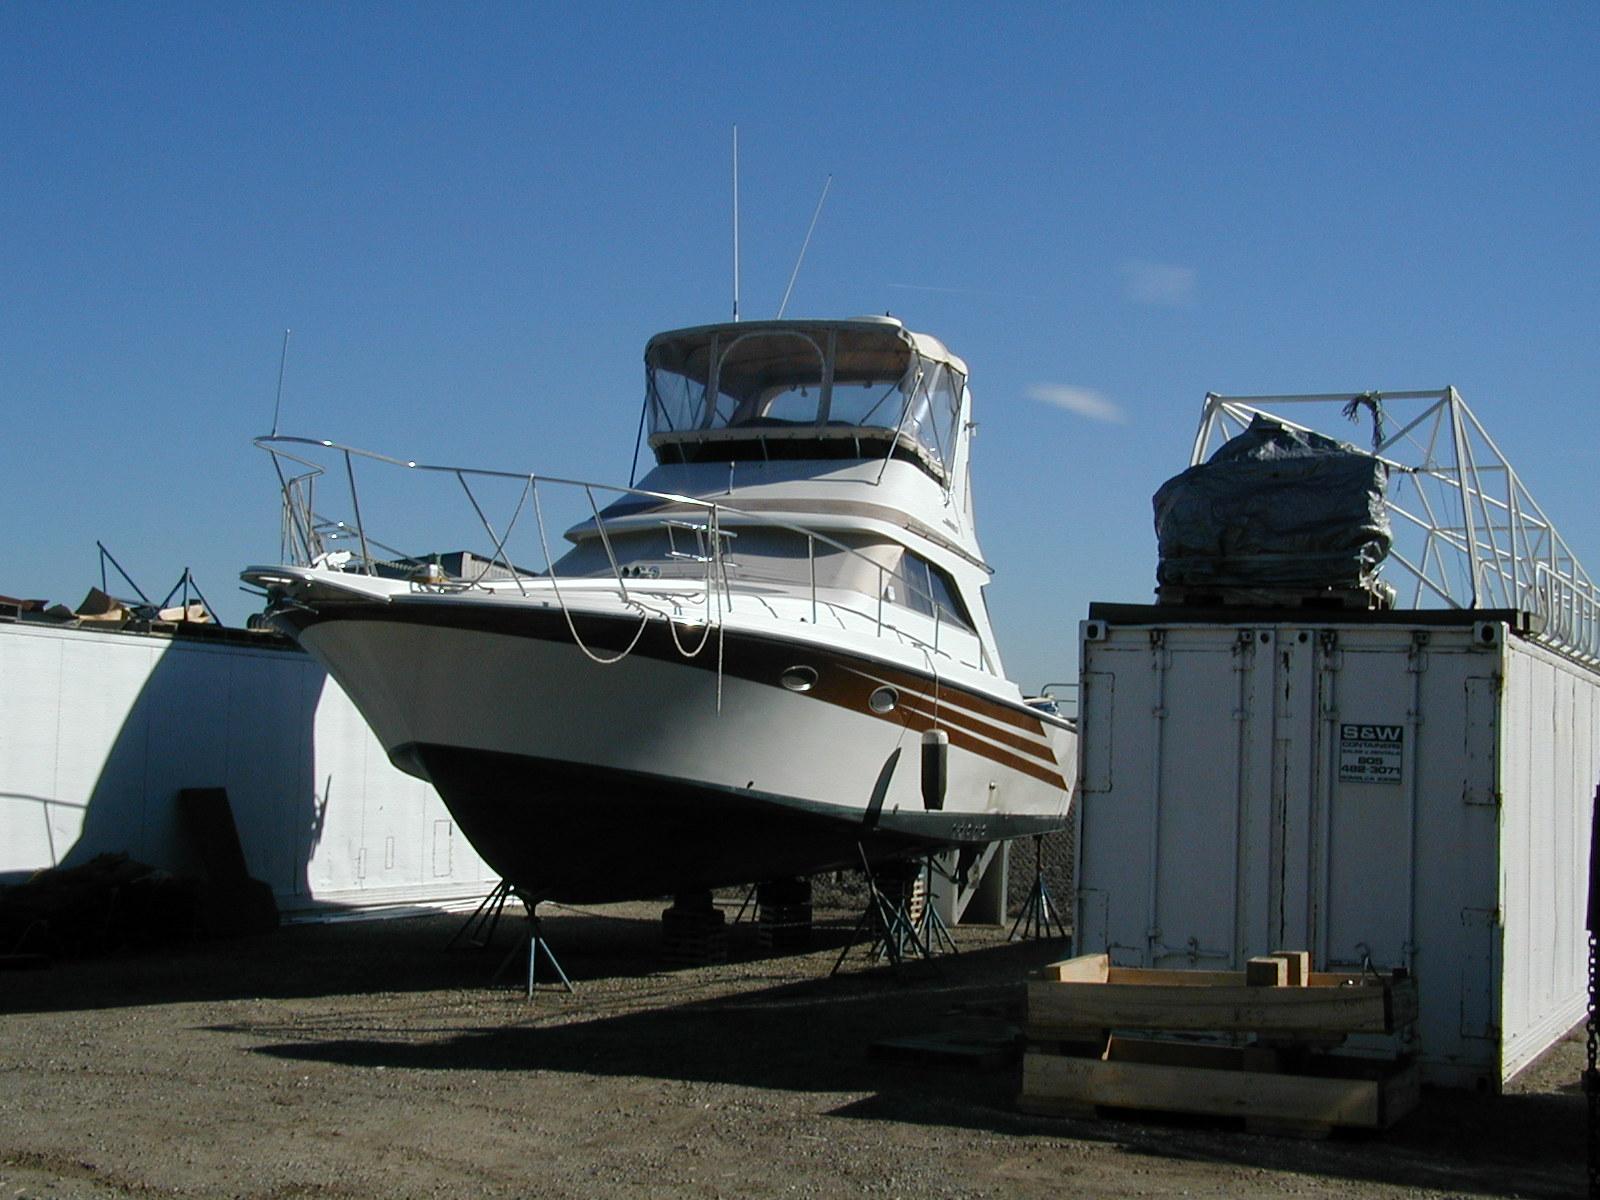 Blocked up at the Seaboard Marine yard